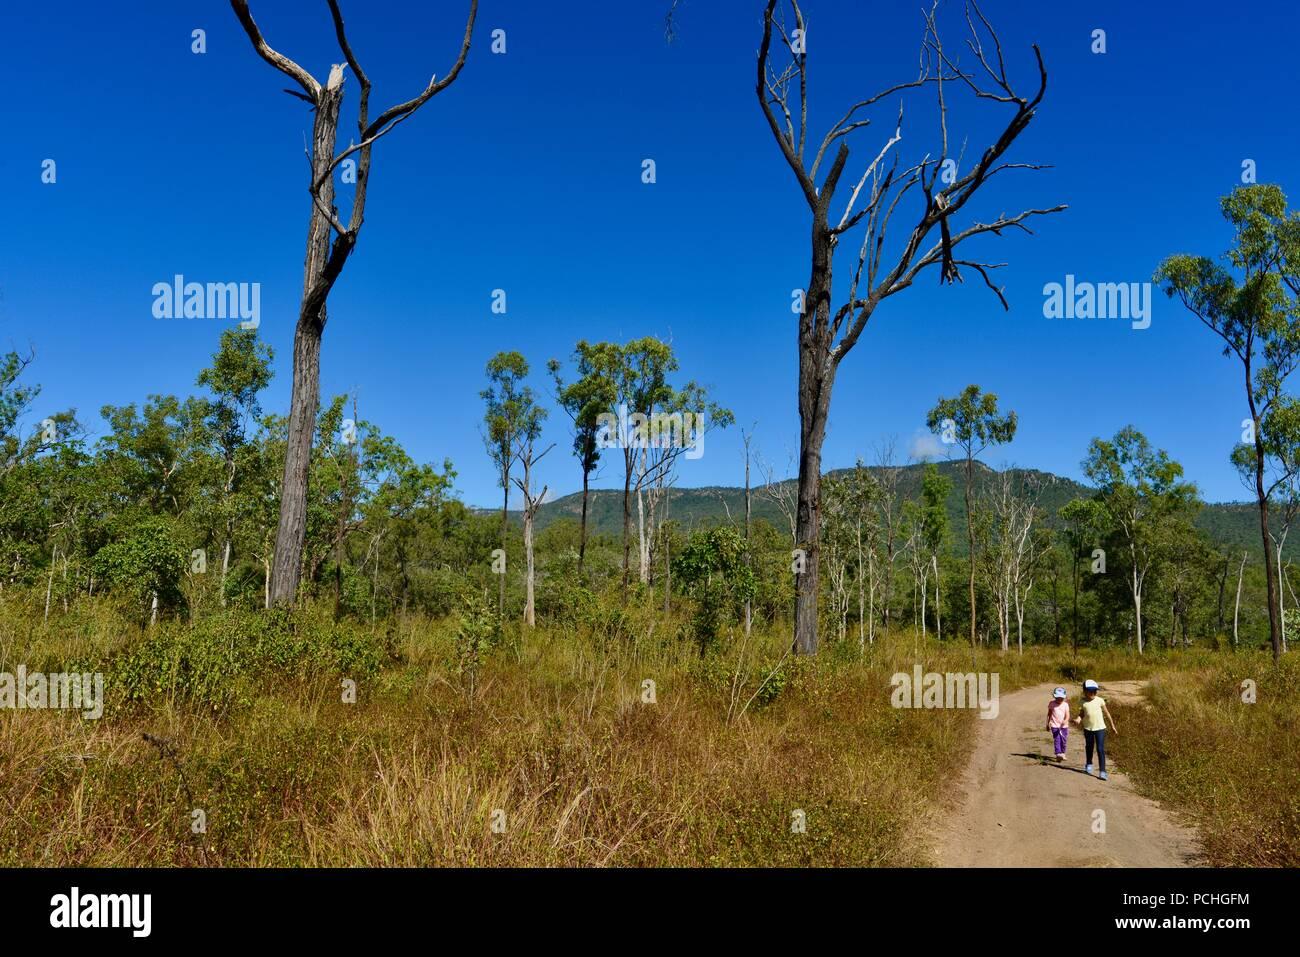 Two children walk down a dry dusty dirt road, Townsville, Queensland, Australia Stock Photo